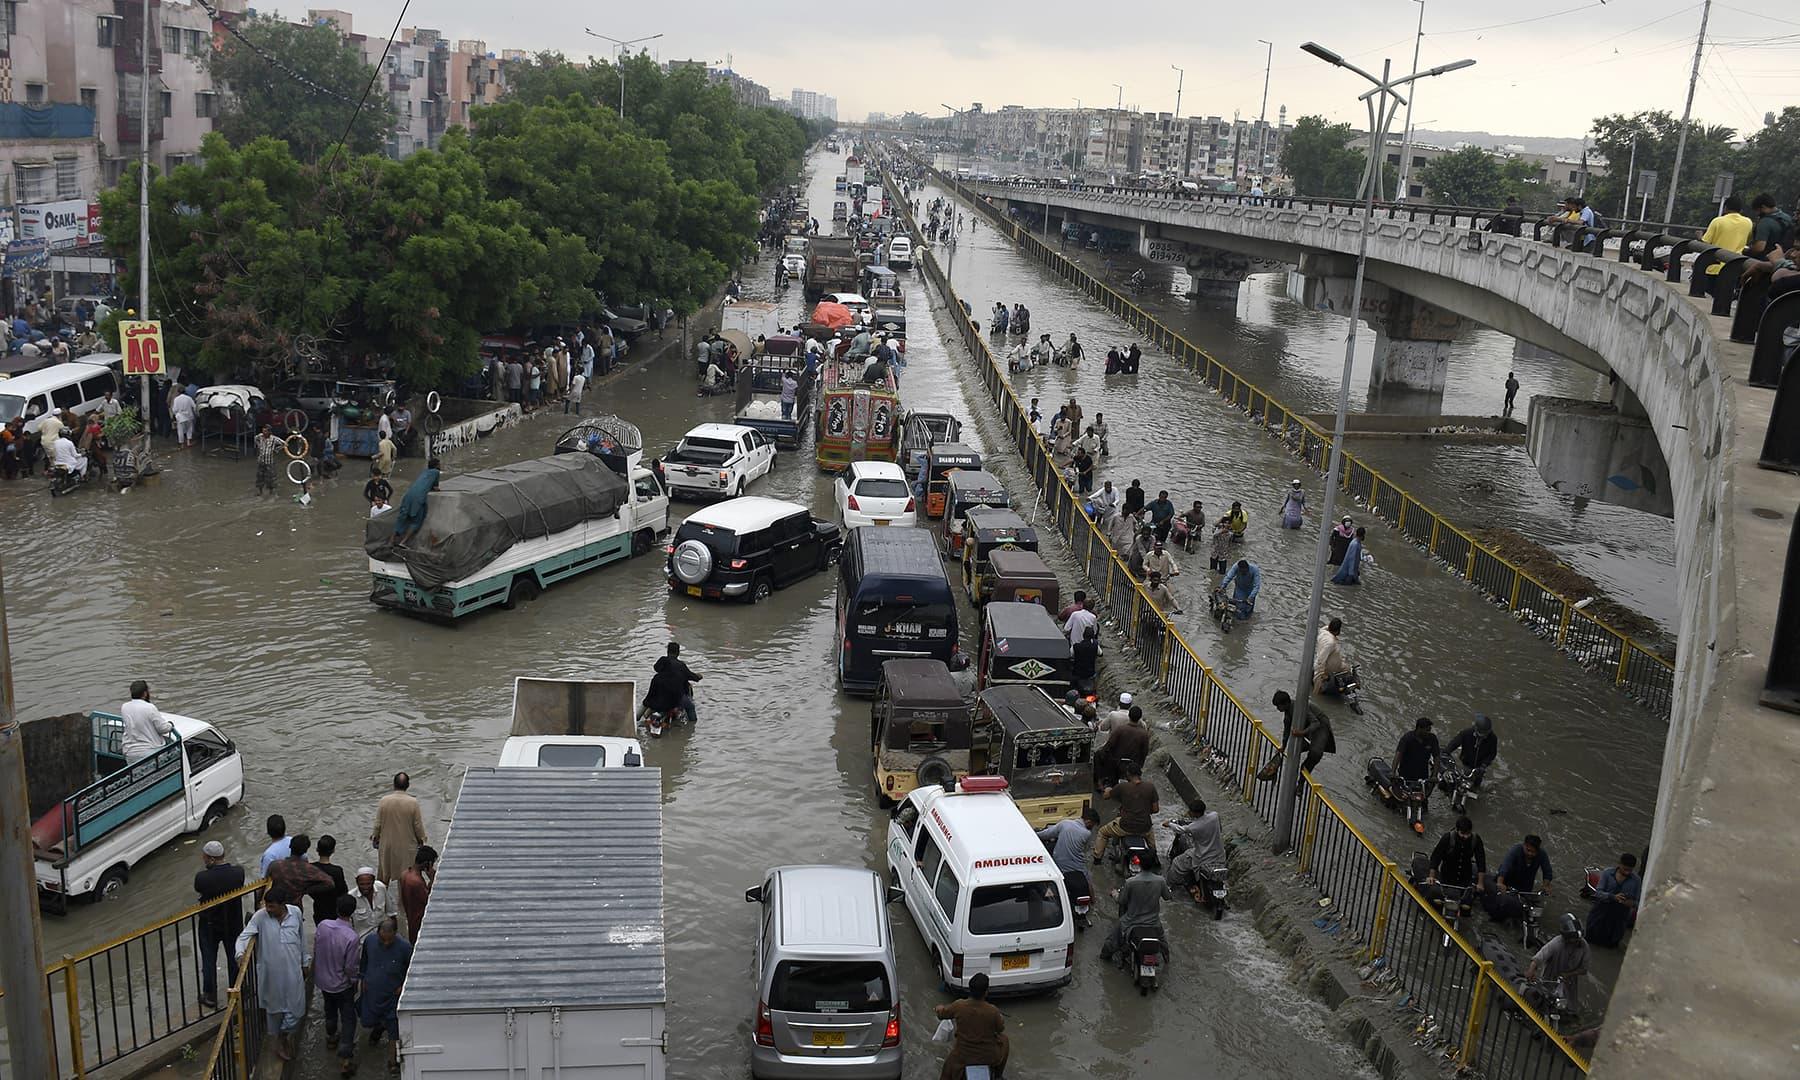 Vehicles drive through a flooded road after heavy rainfall in Karachi, Thursday, Sept 23. — AP